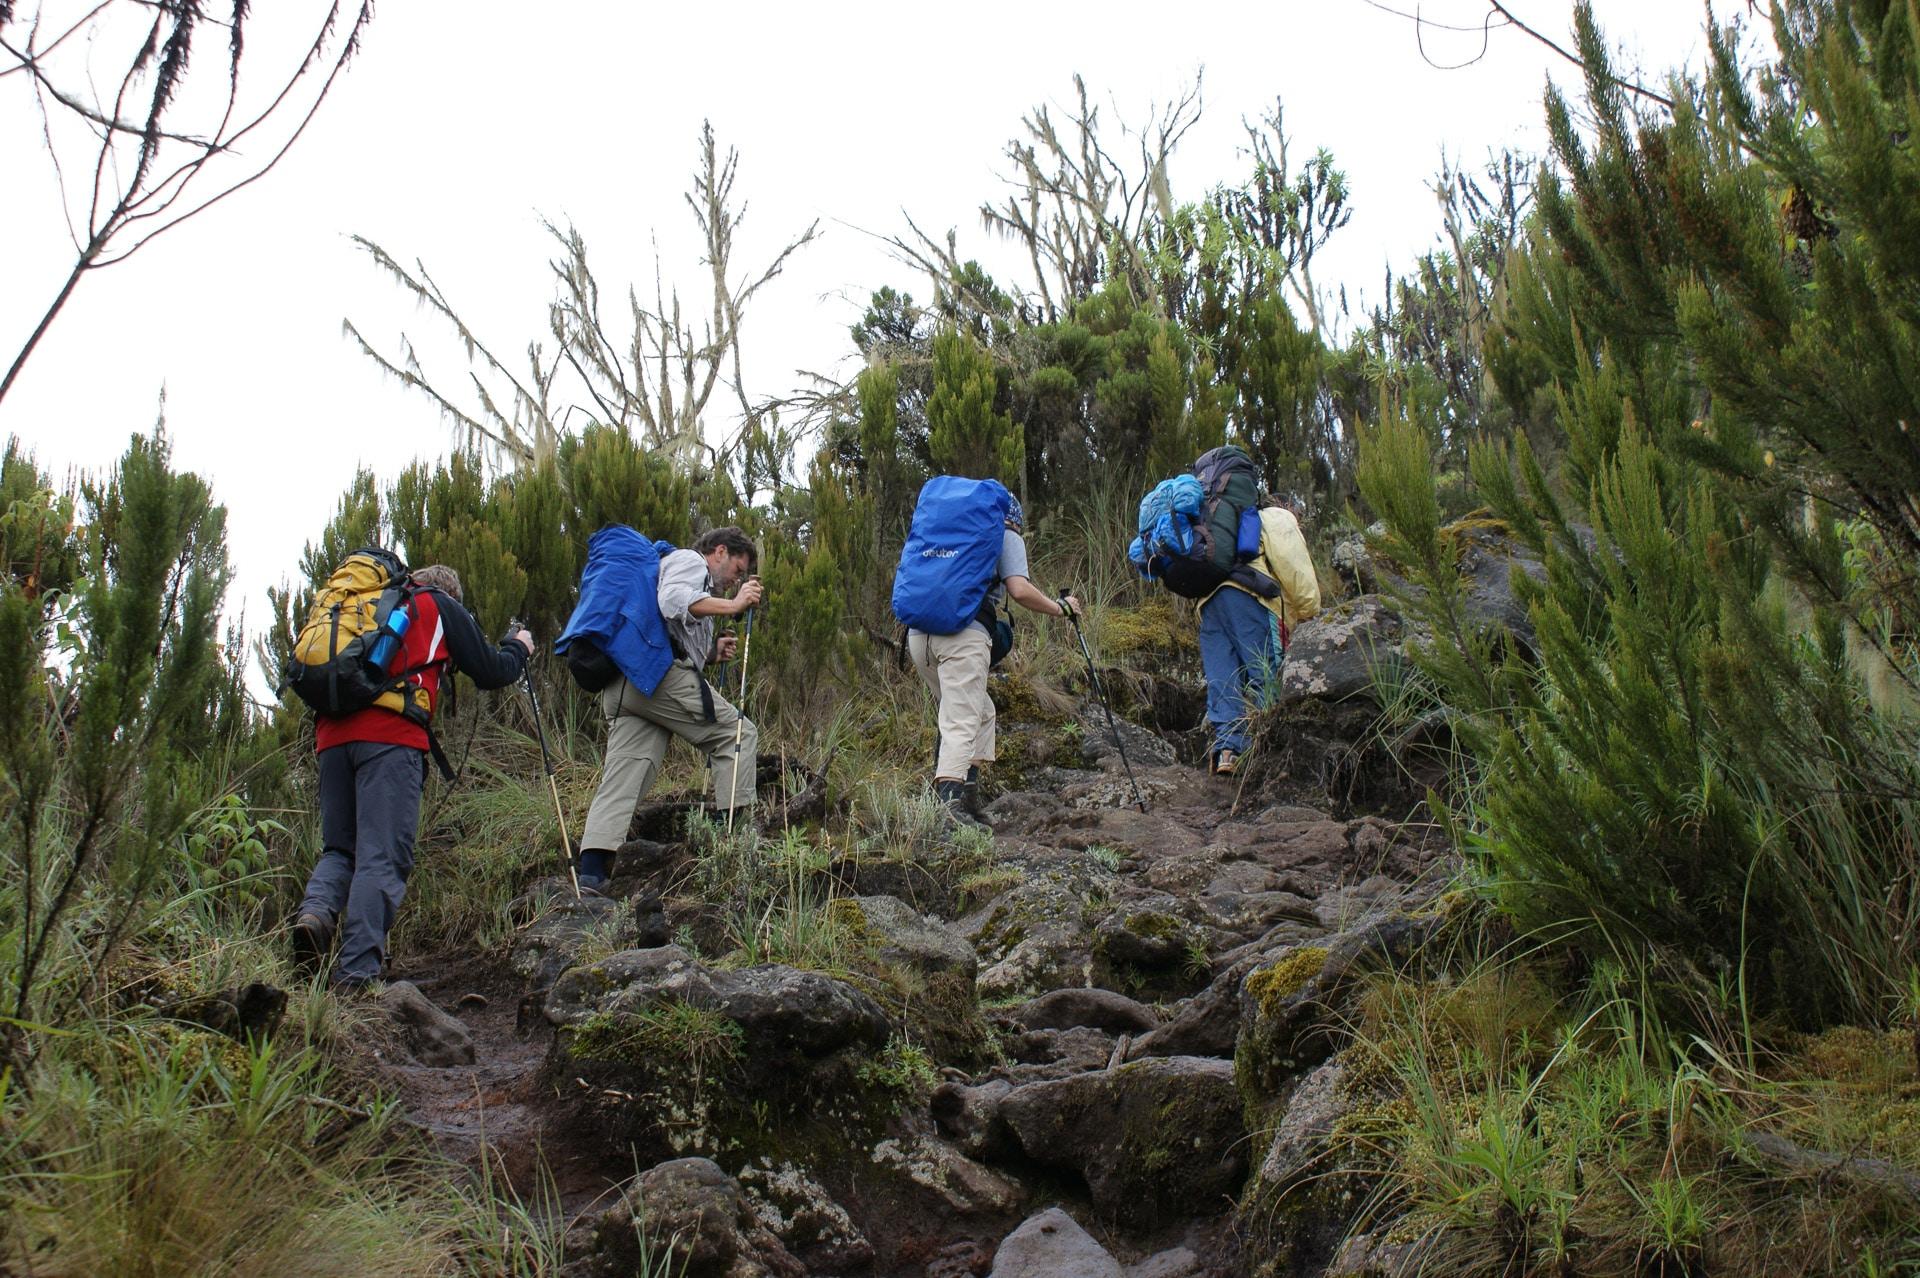 Kilimanjaro-Tansania-Globetrotter-Select-Krause-02